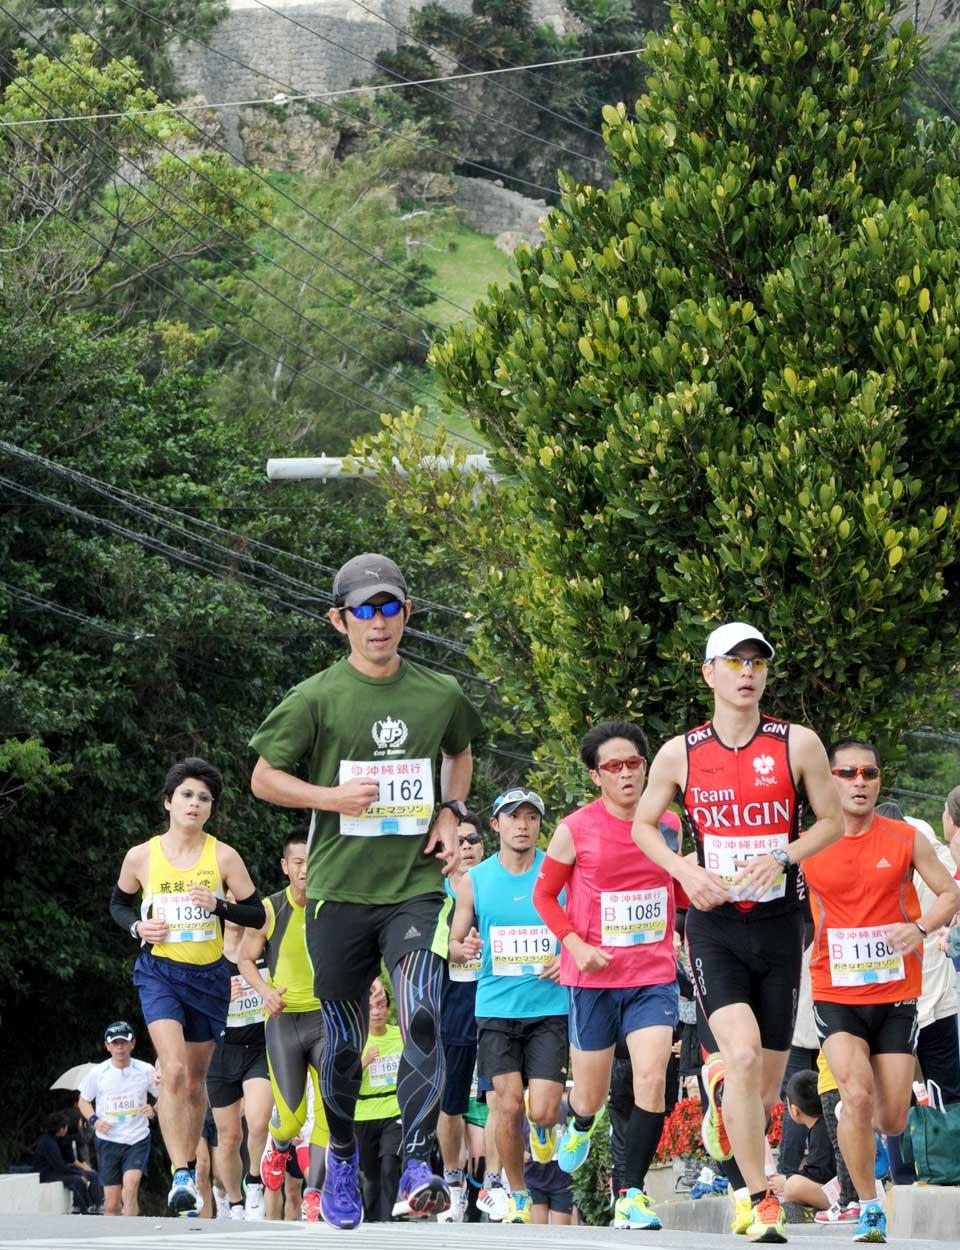 Okinawa Marathon 2015: Defining Friendship, Dreams and Love!